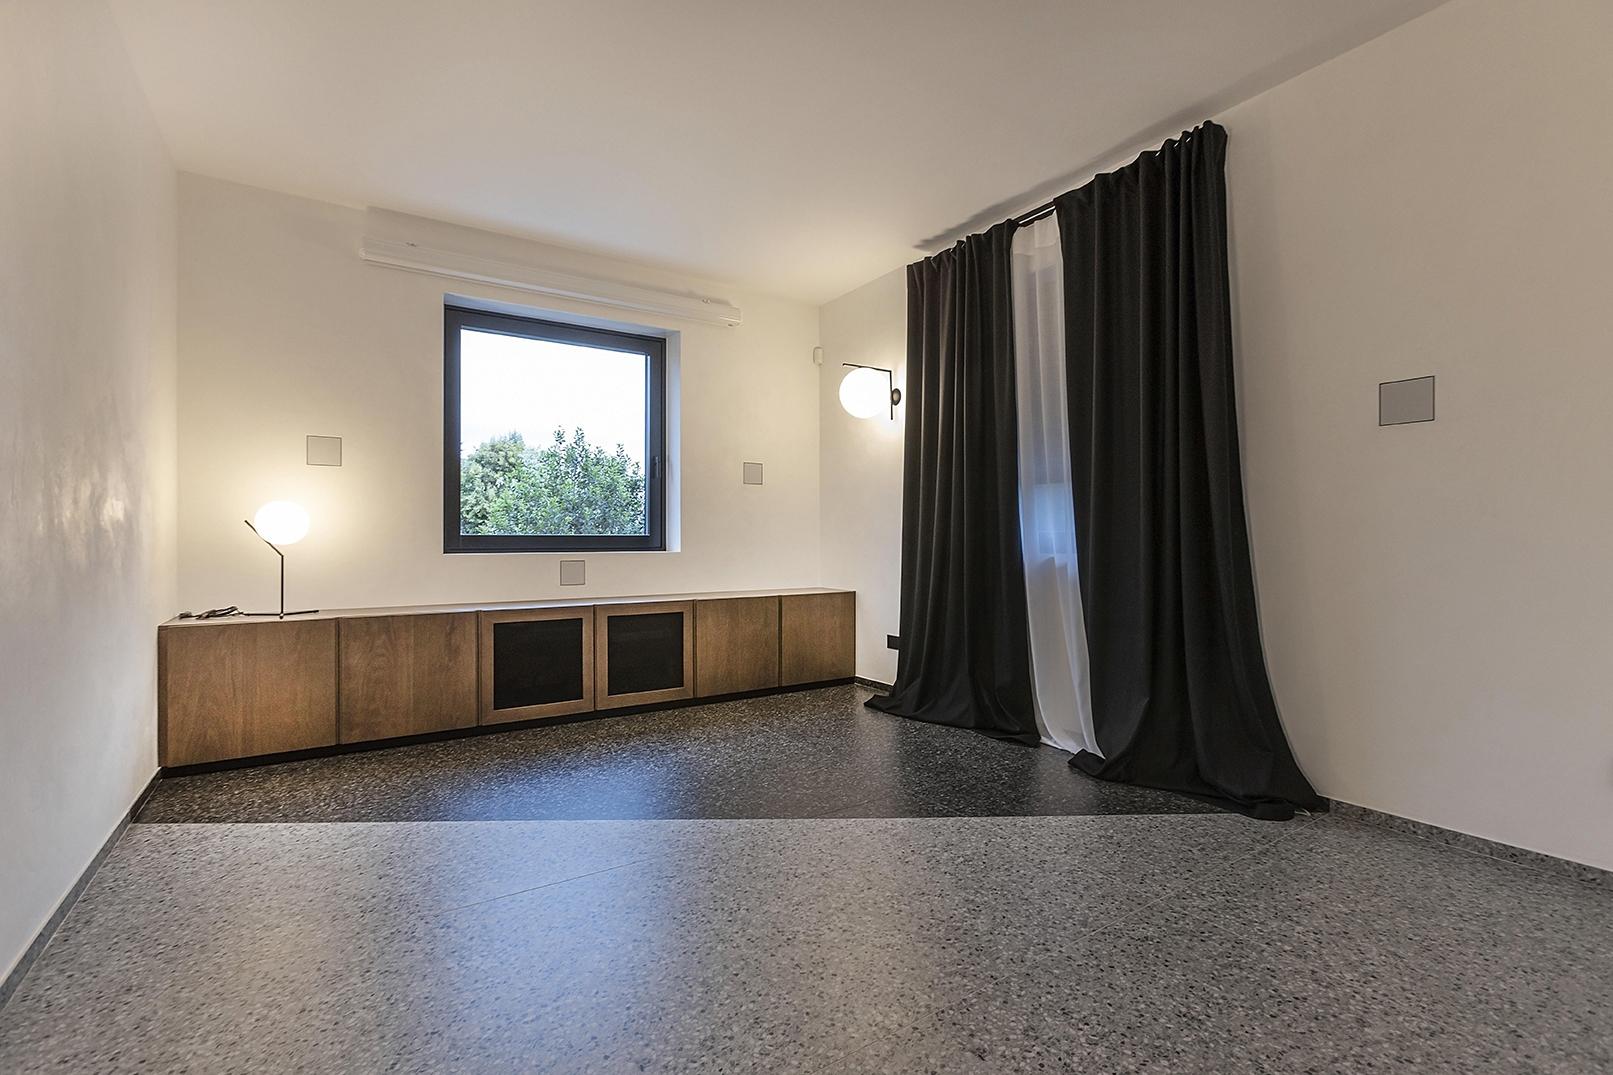 15-Maison-Verona-2019_3